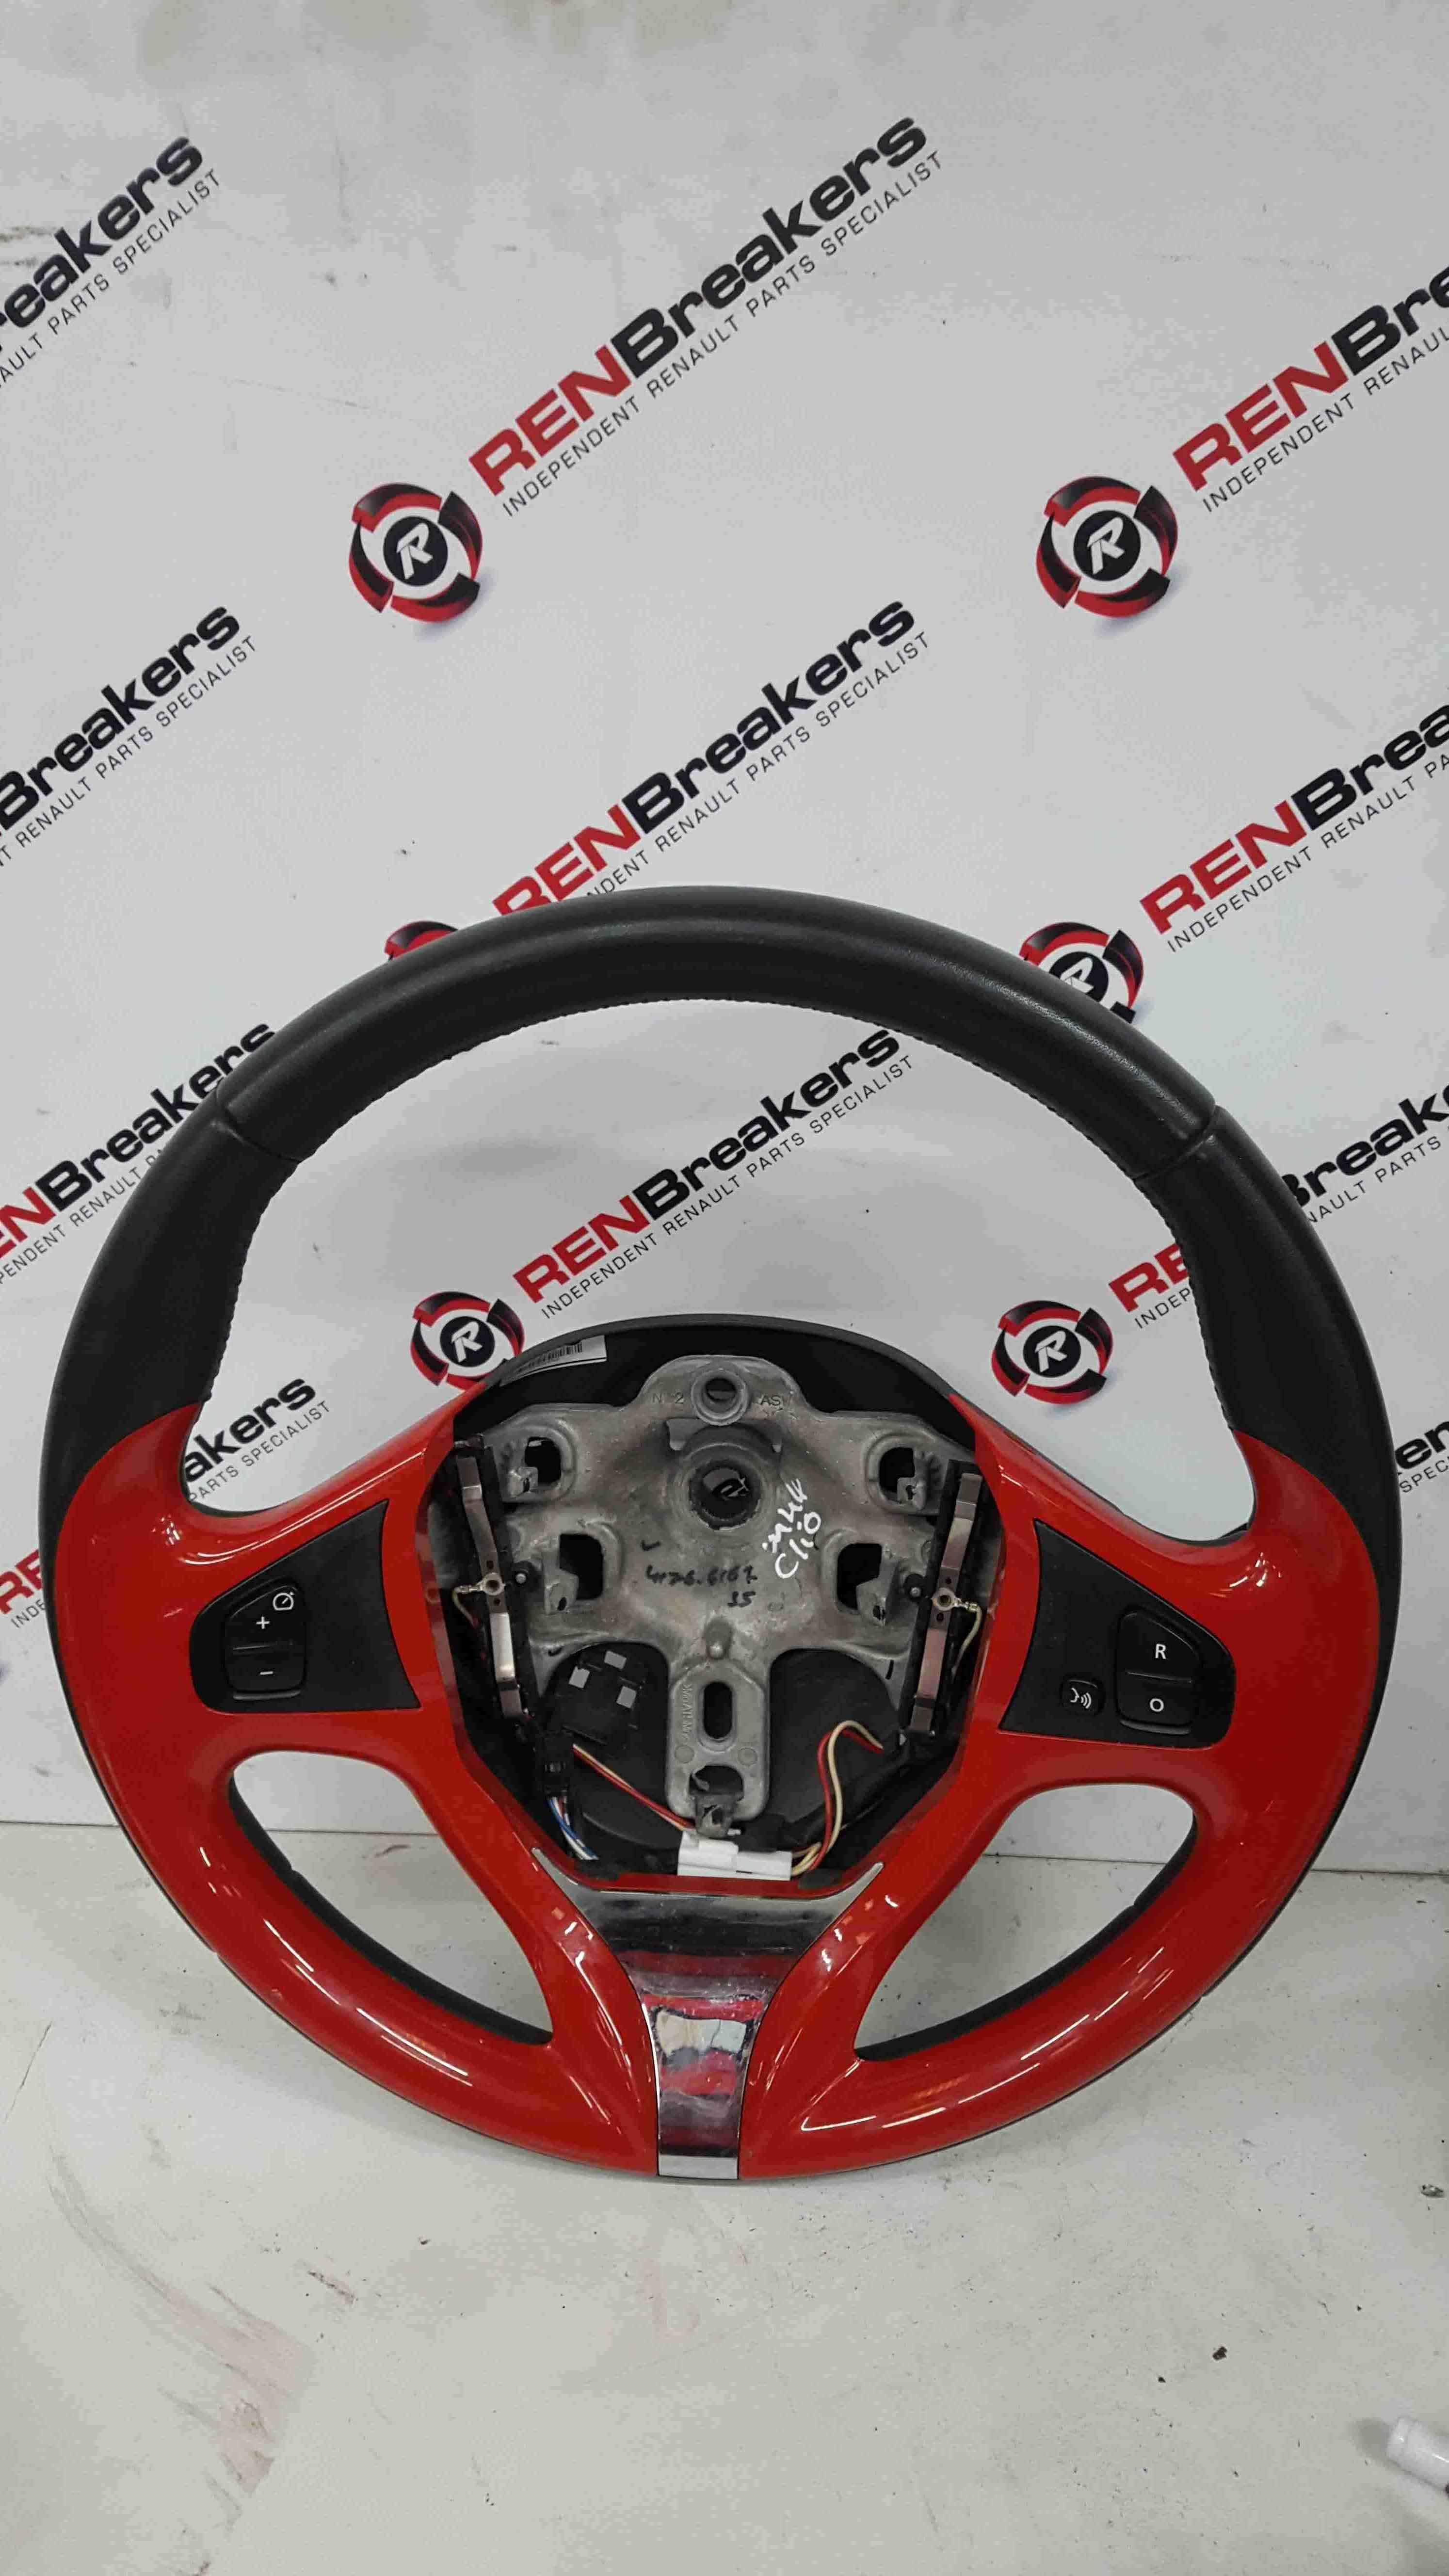 Renault Clio MK4 2013-2018 Steering Wheel Red Cruise 484006096R